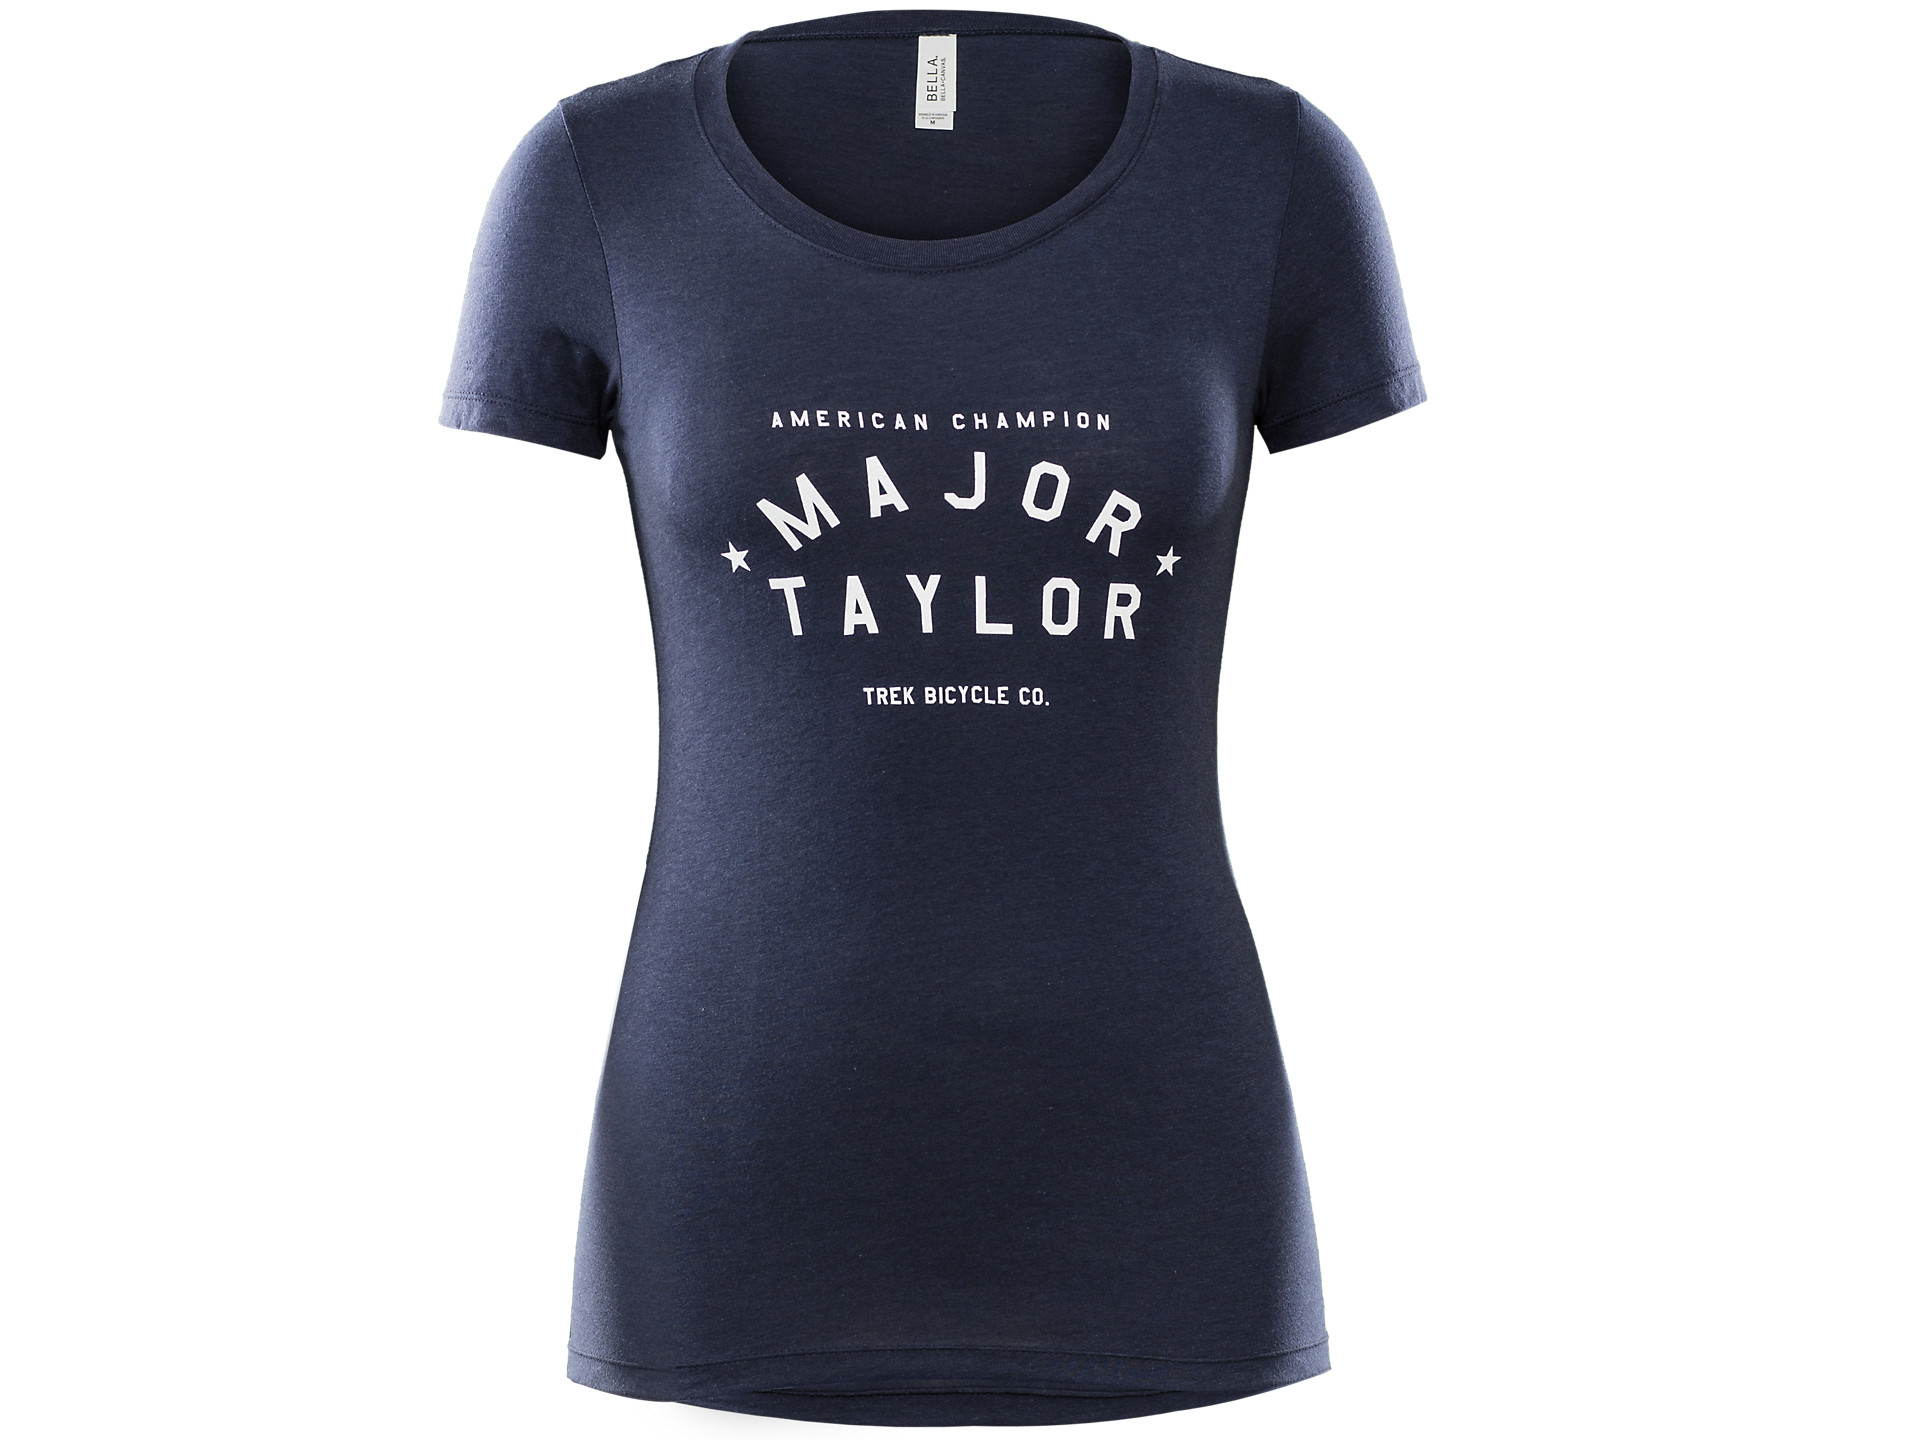 9edcc5df Trek Major Taylor Women's Script T-shirt